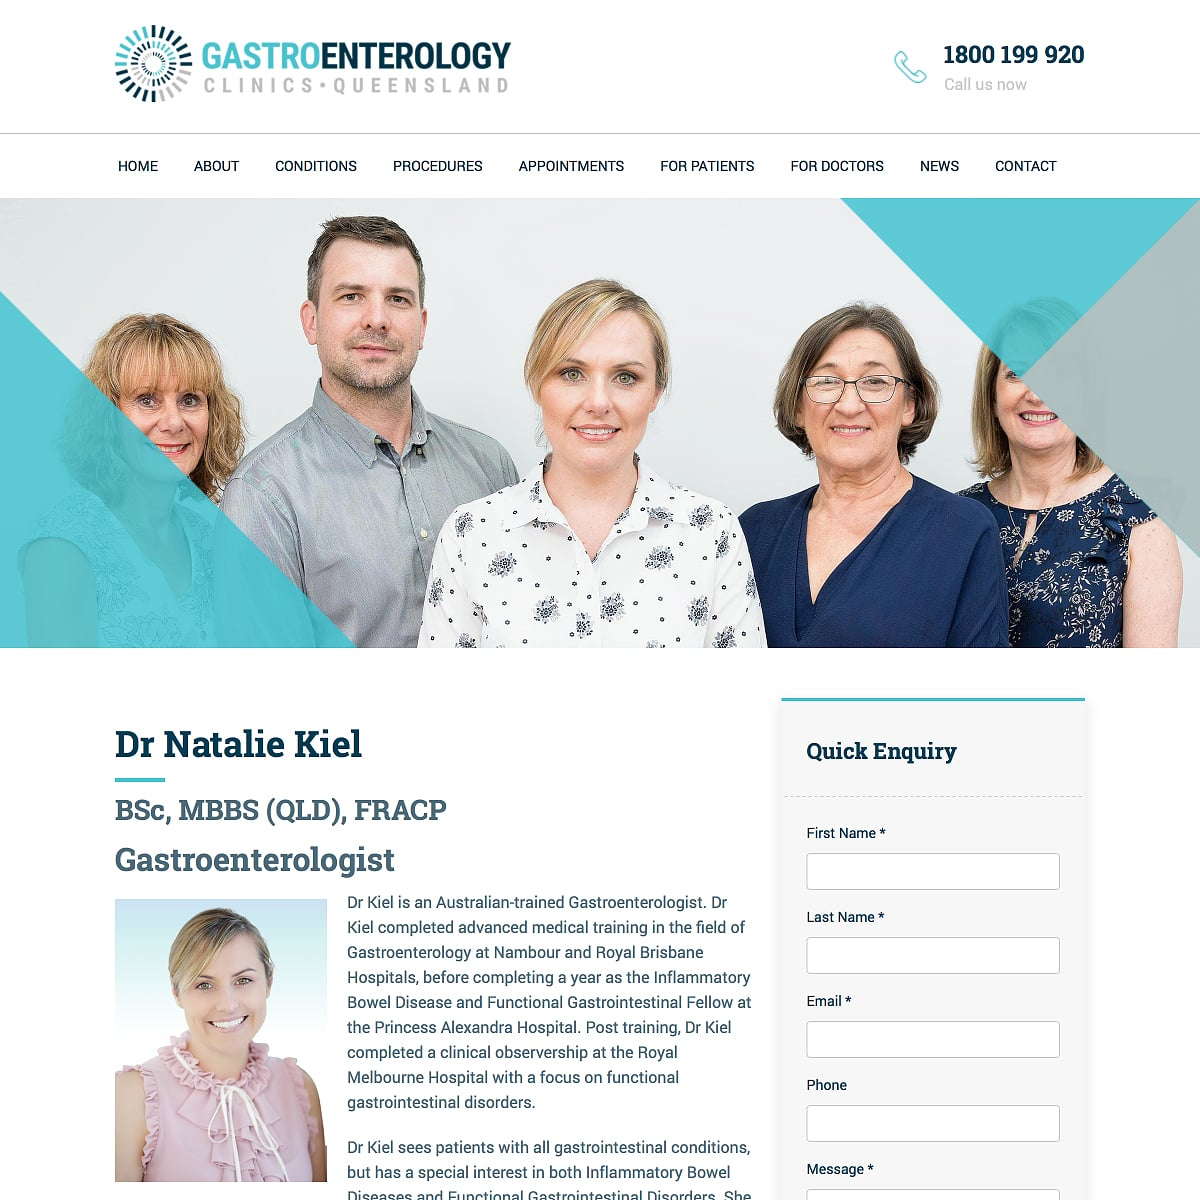 Gastroenterology Clinics Queensland - Bio